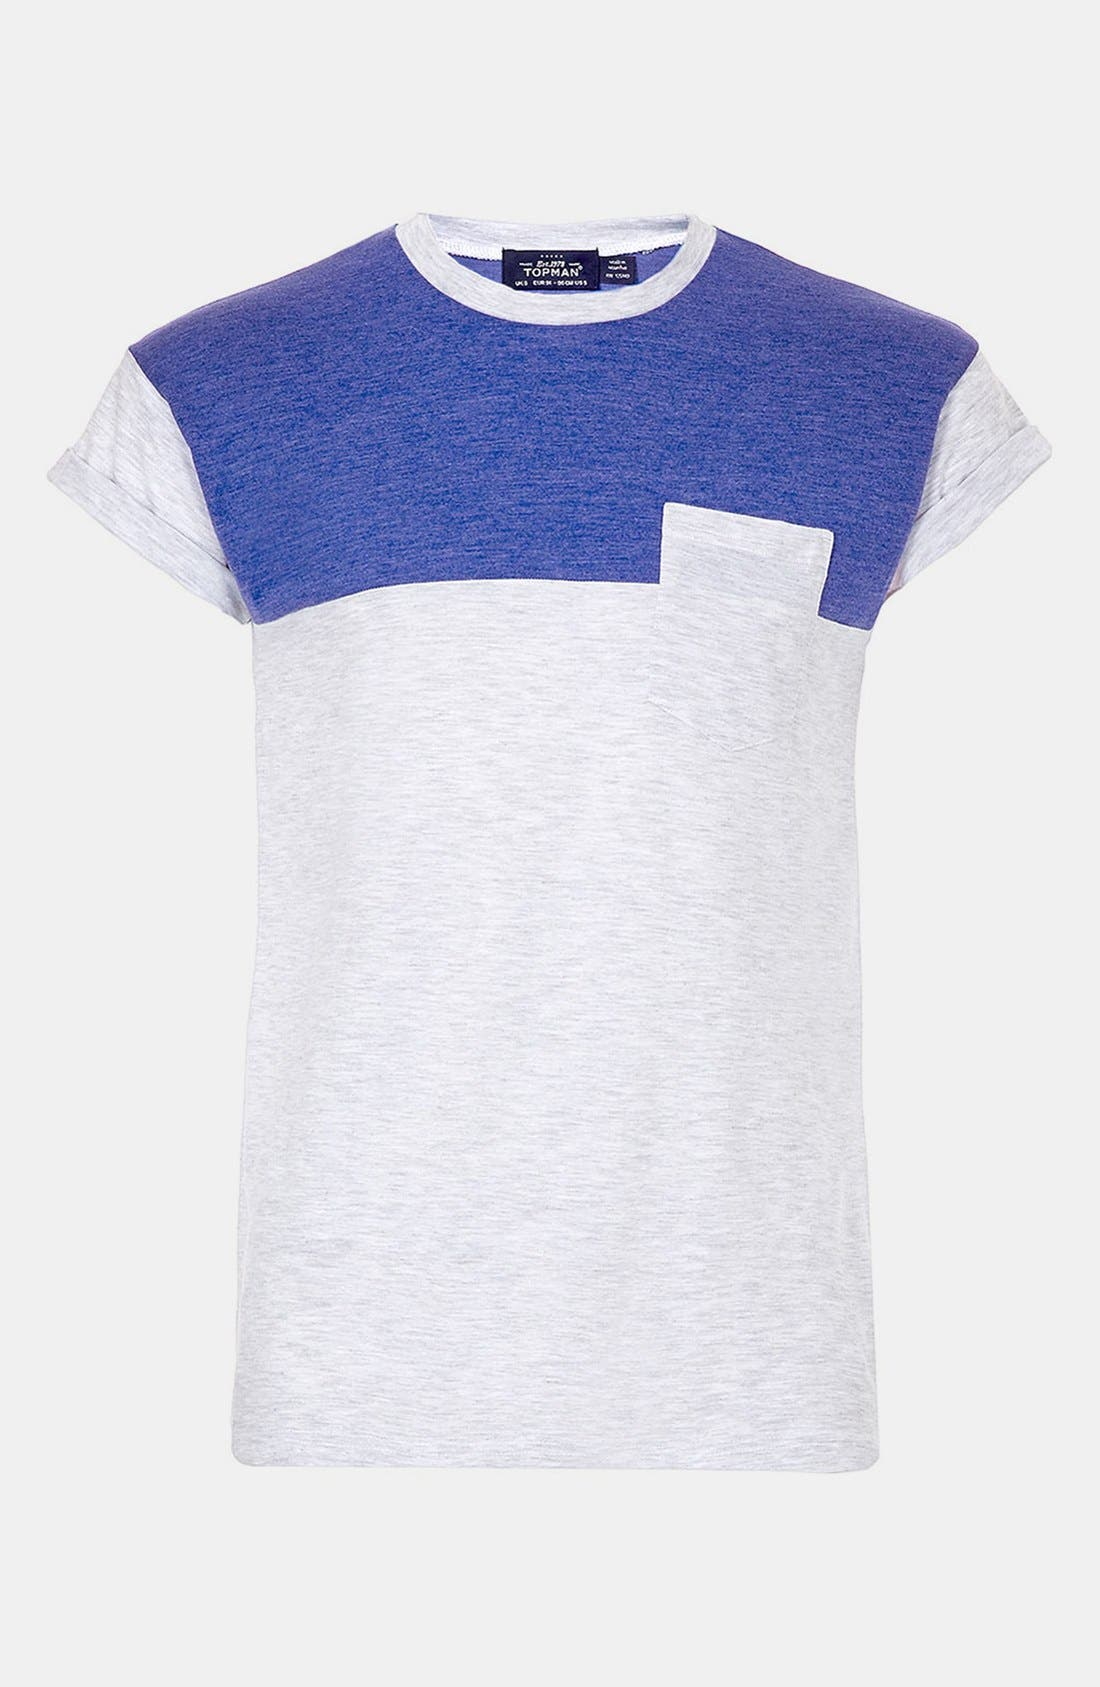 Alternate Image 1 Selected - Topman 'Cut & Sew' T-Shirt